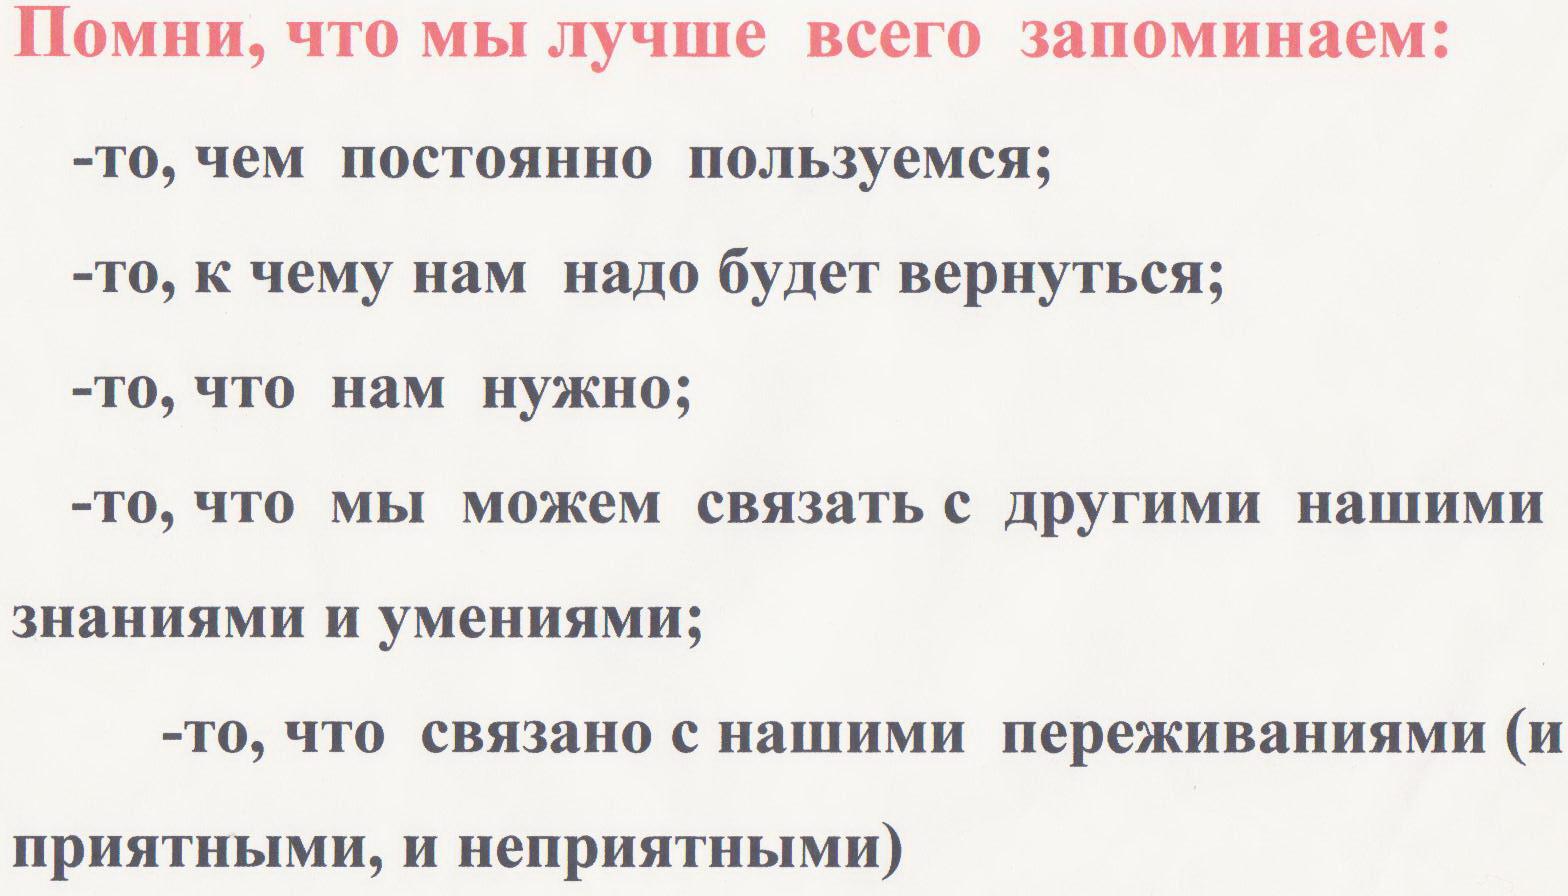 C:\Users\Юля\Desktop\Кузнецова аттестация\сканированные грамоты\Кузнецова 053.jpg